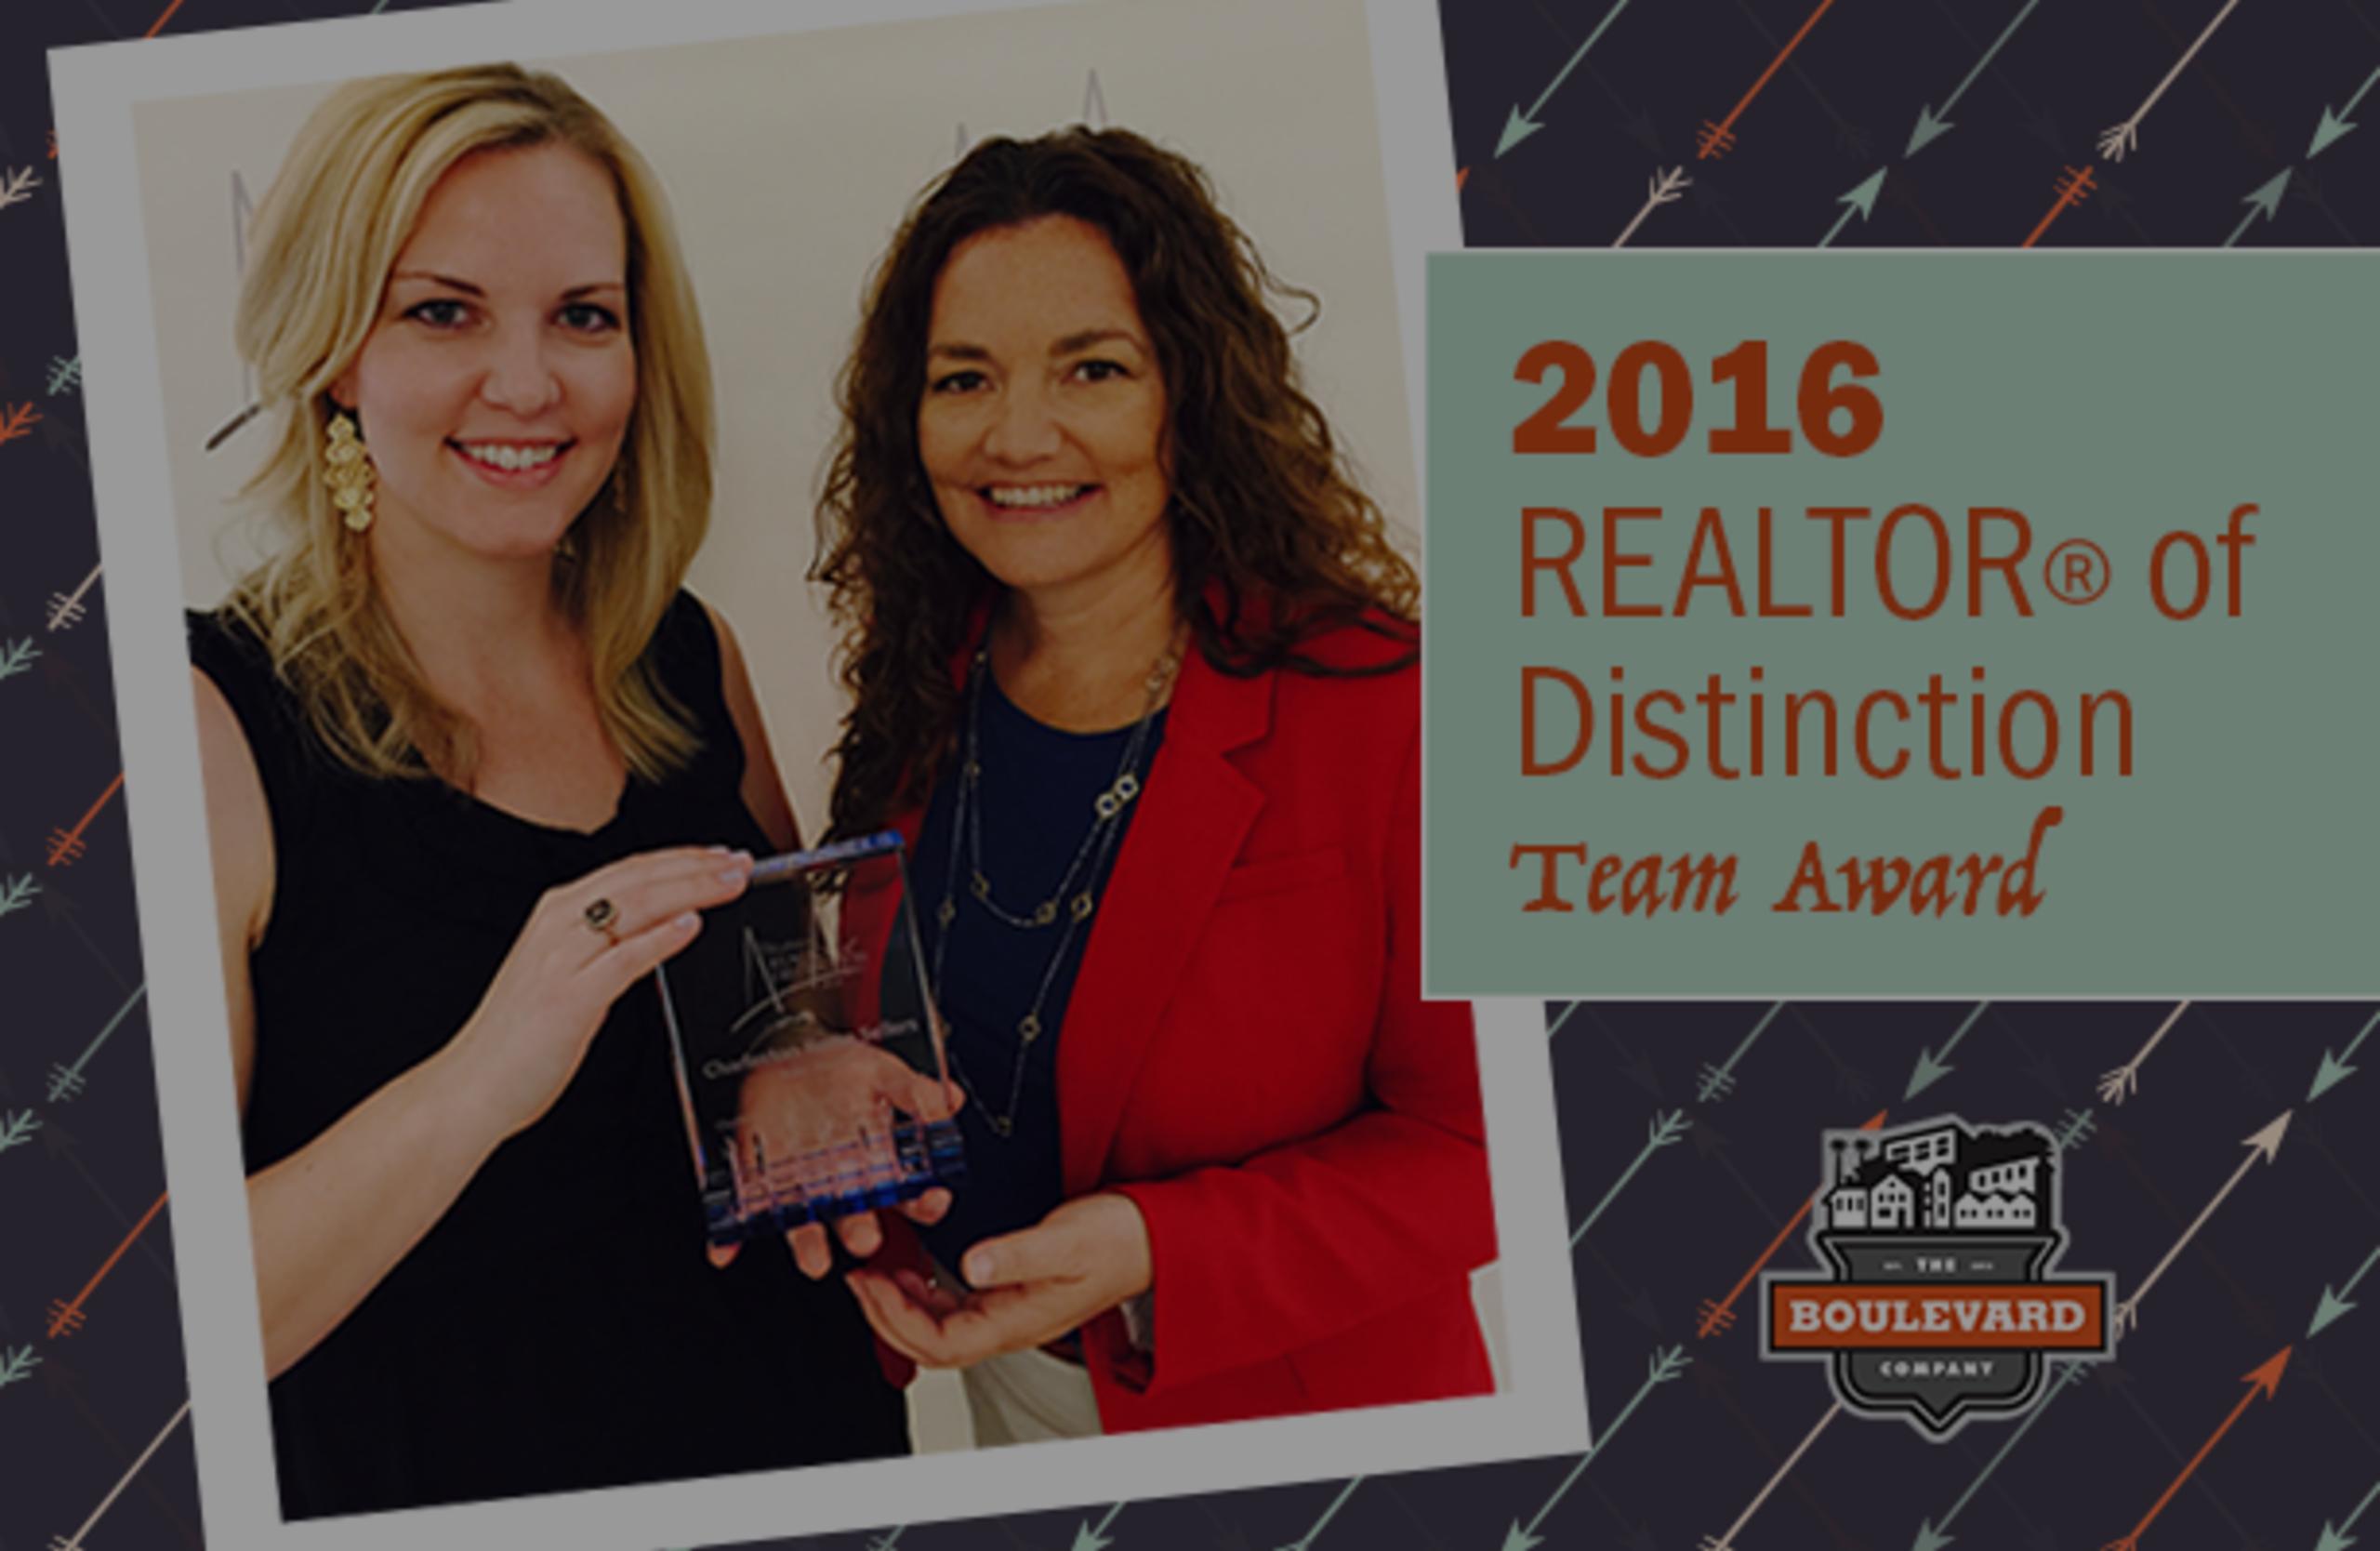 2016 REALTOR® of Distinction Award